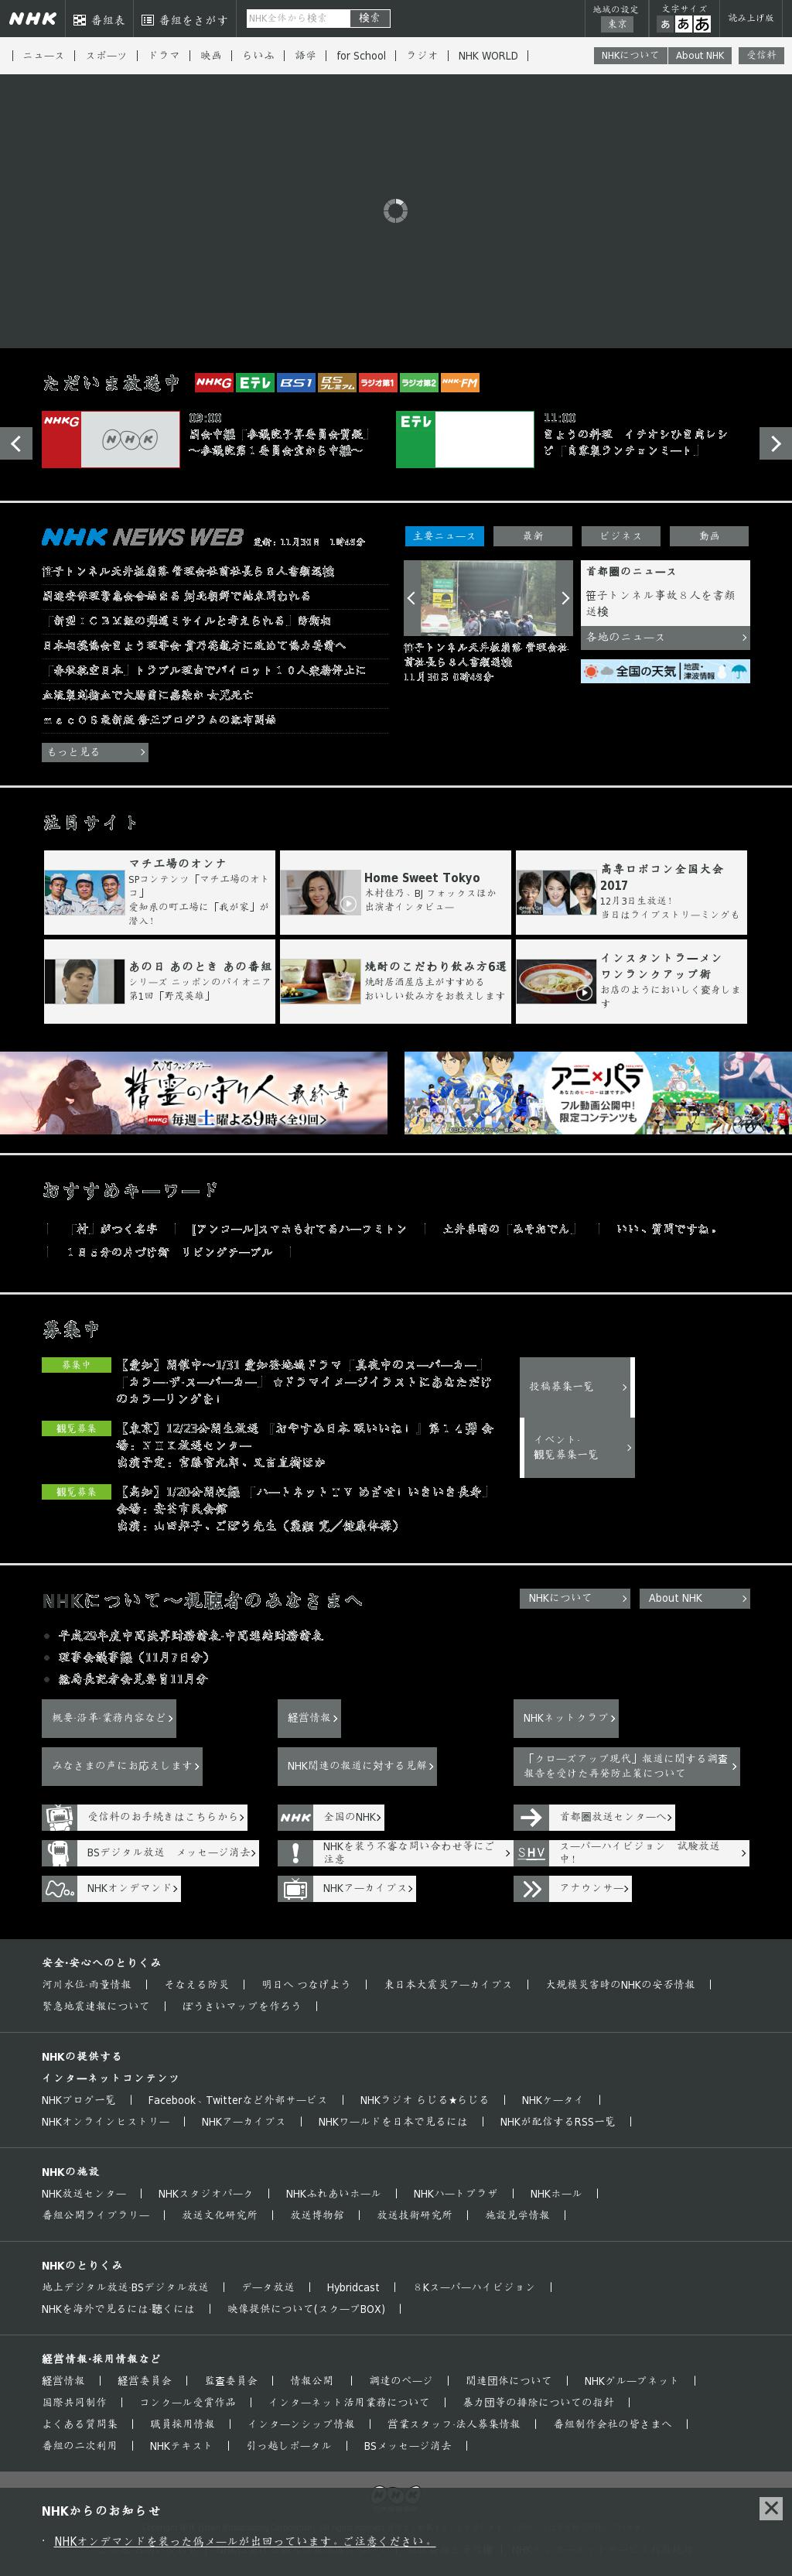 NHK Online at Monday March 12, 2018, 2:15 a.m. UTC